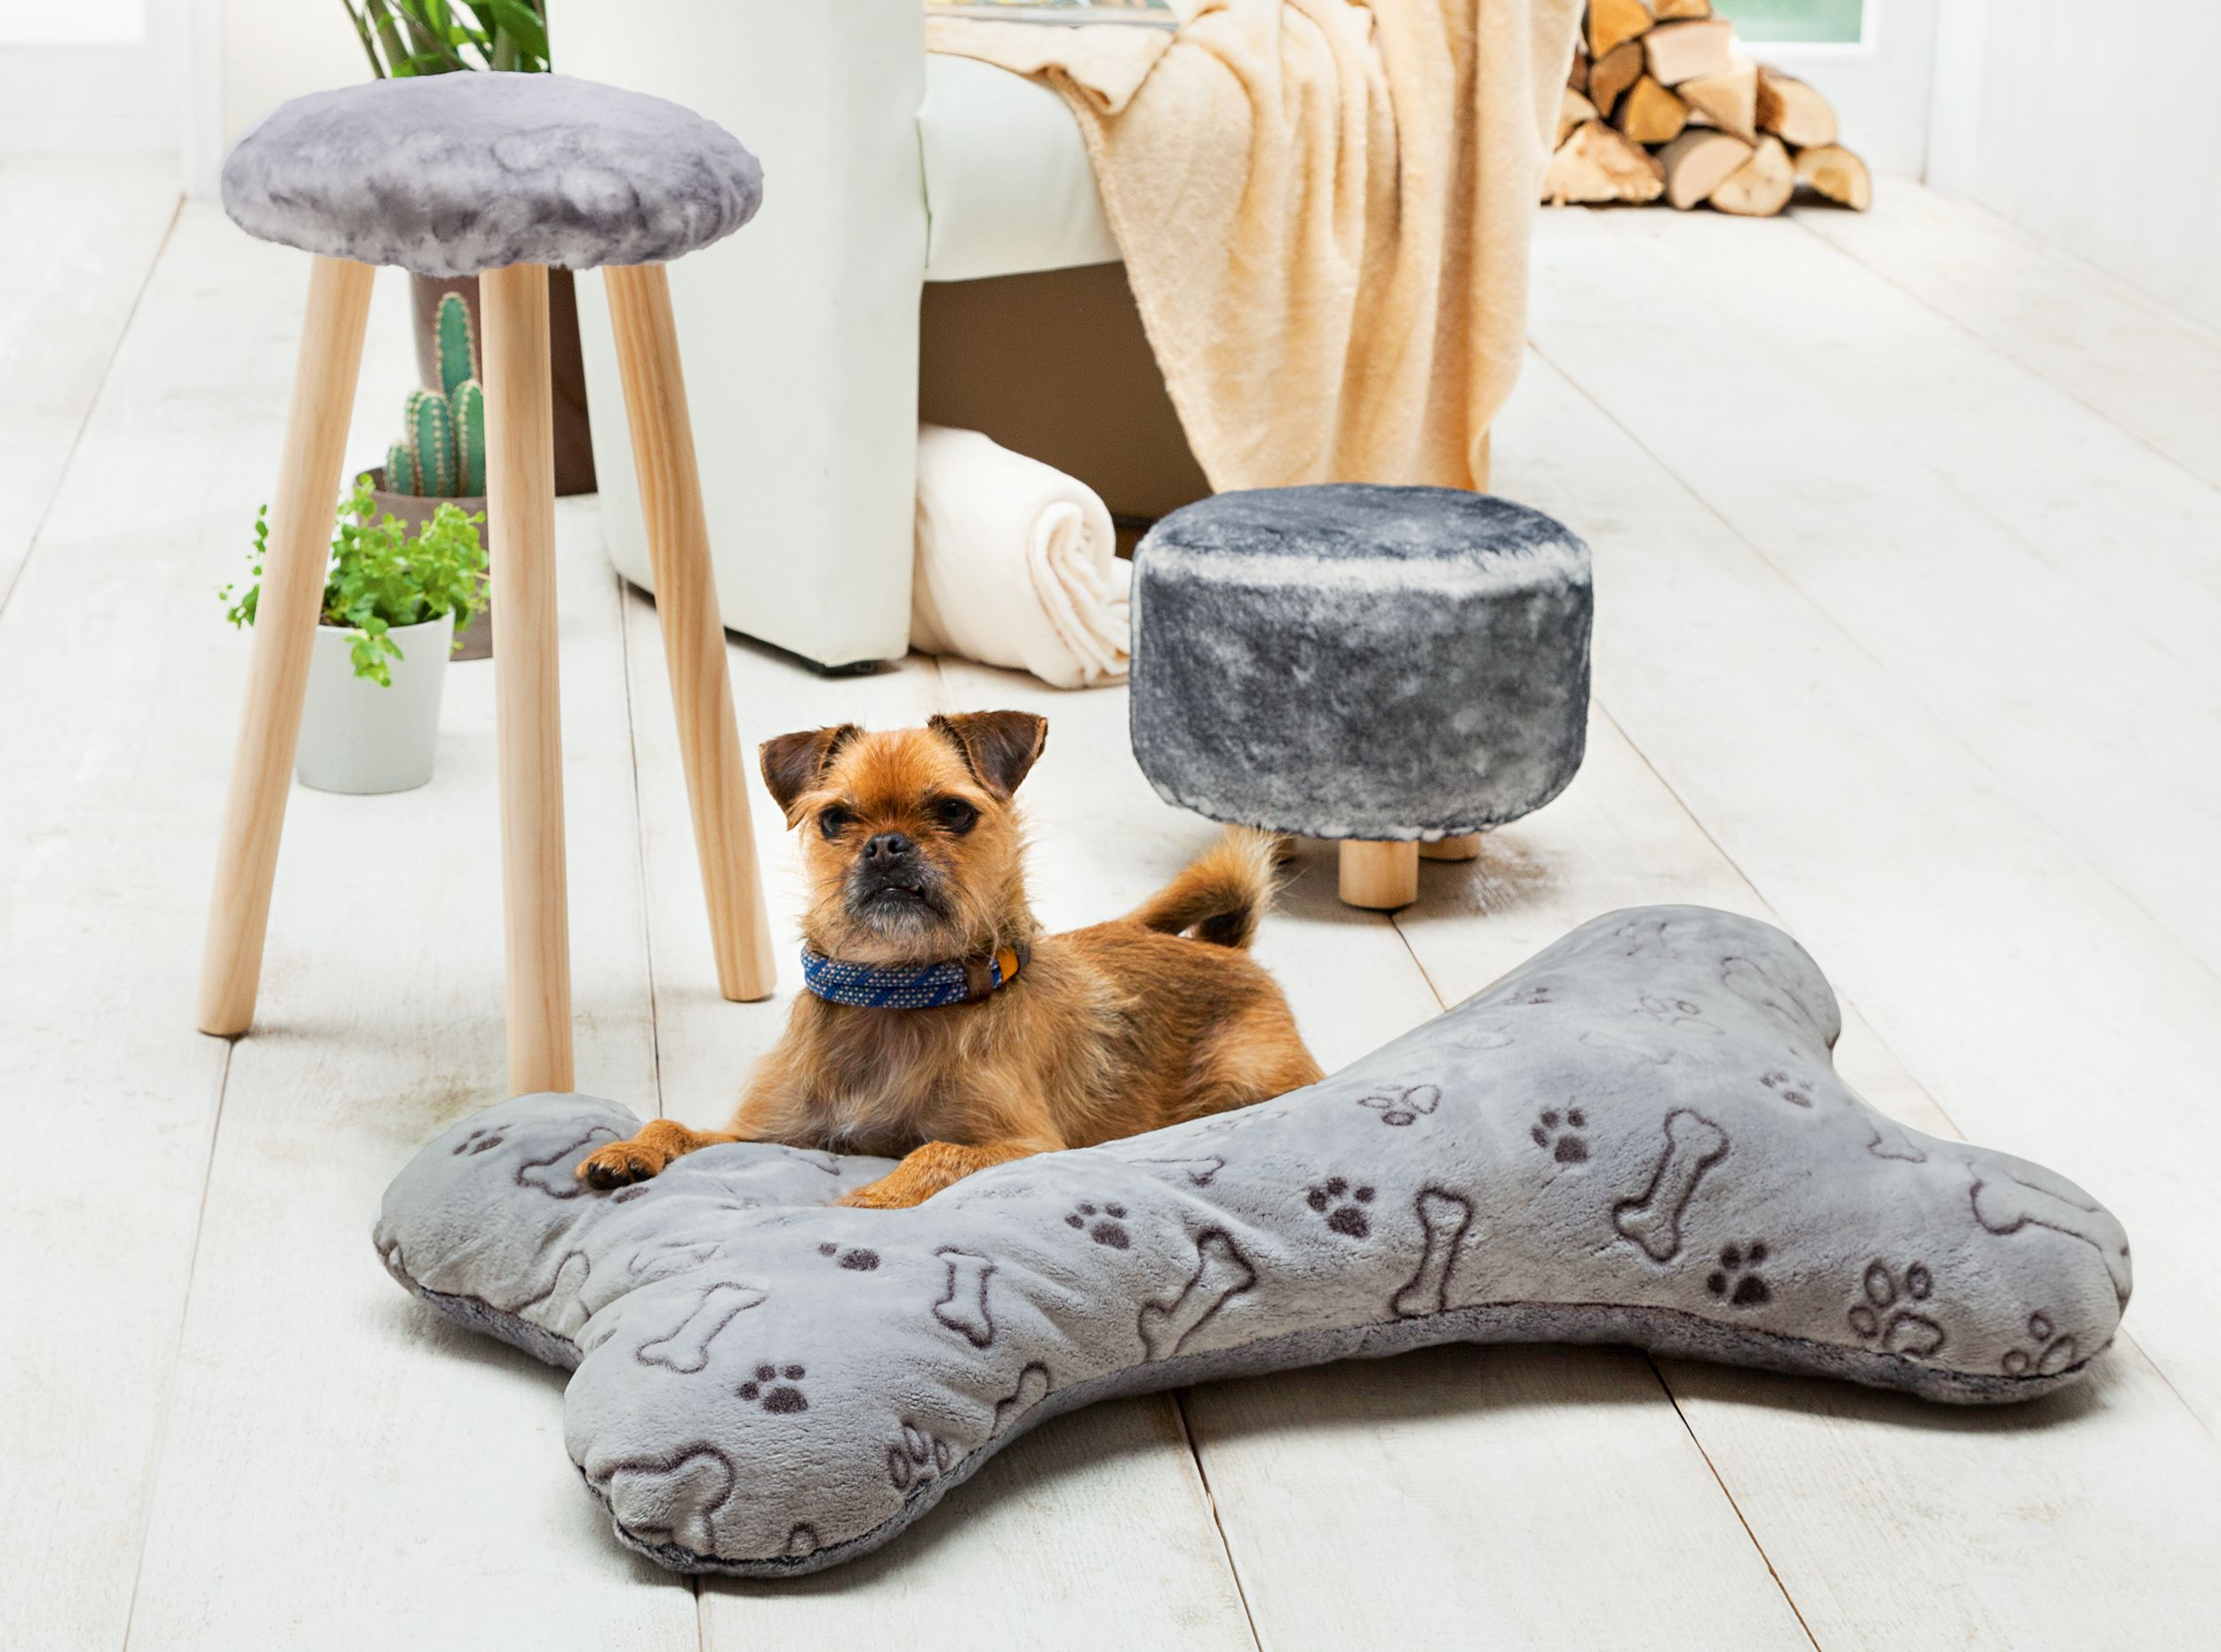 anleitung knochen kissen f r hunde n hen n hen. Black Bedroom Furniture Sets. Home Design Ideas